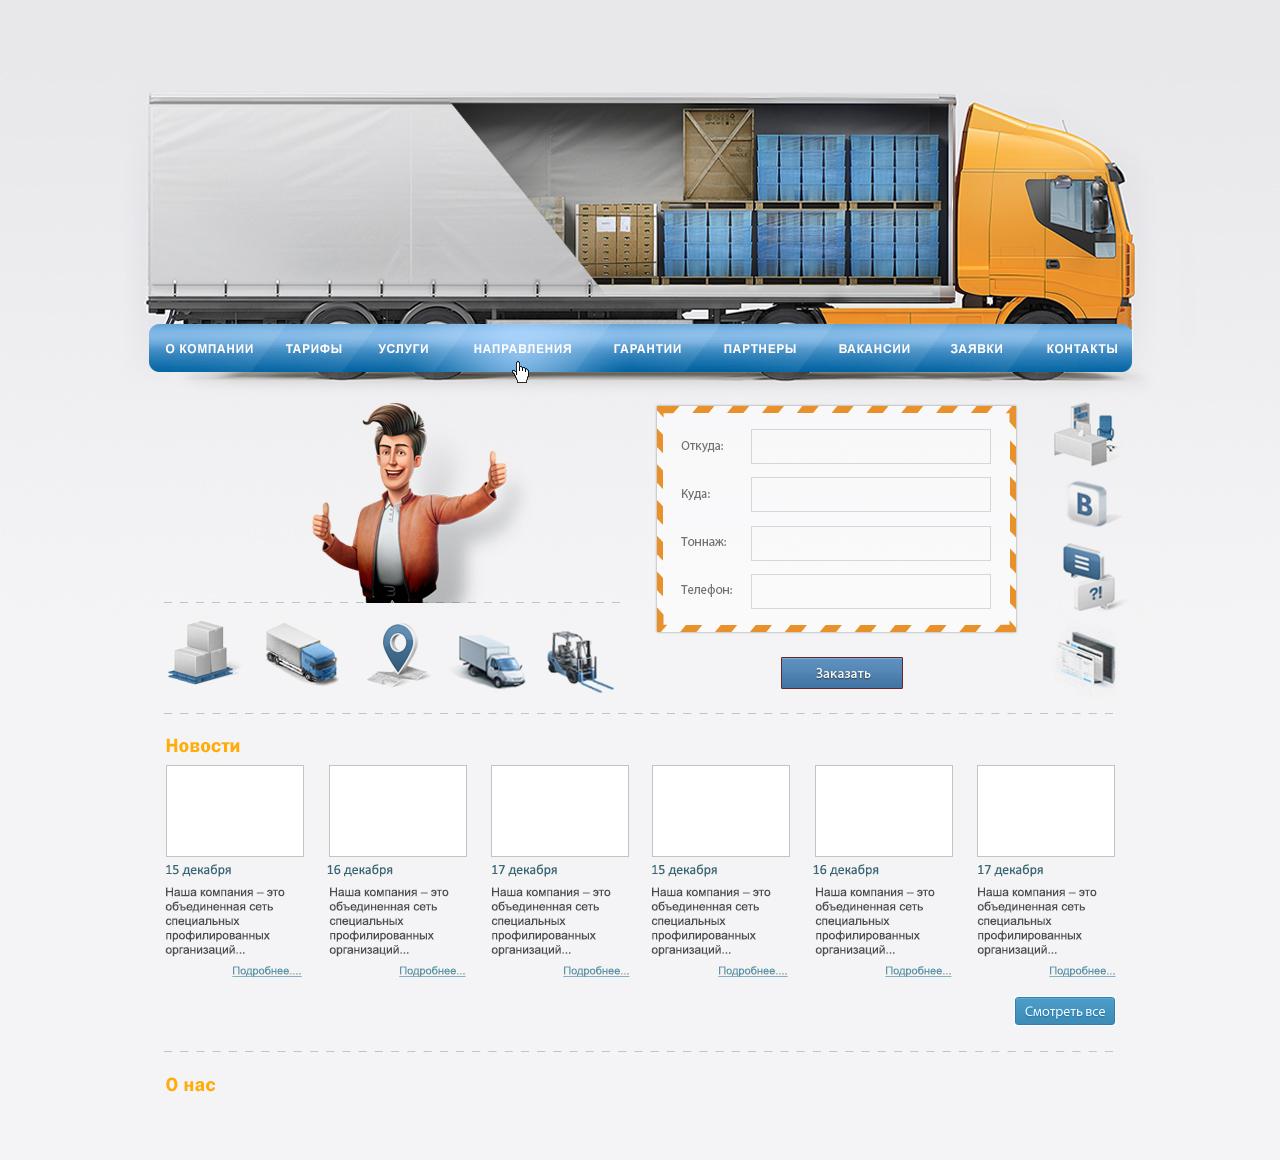 Дизайн сайта транспортно-экспедиторской компании ЛогикТранс фото f_2105a47f9d1dff90.jpg